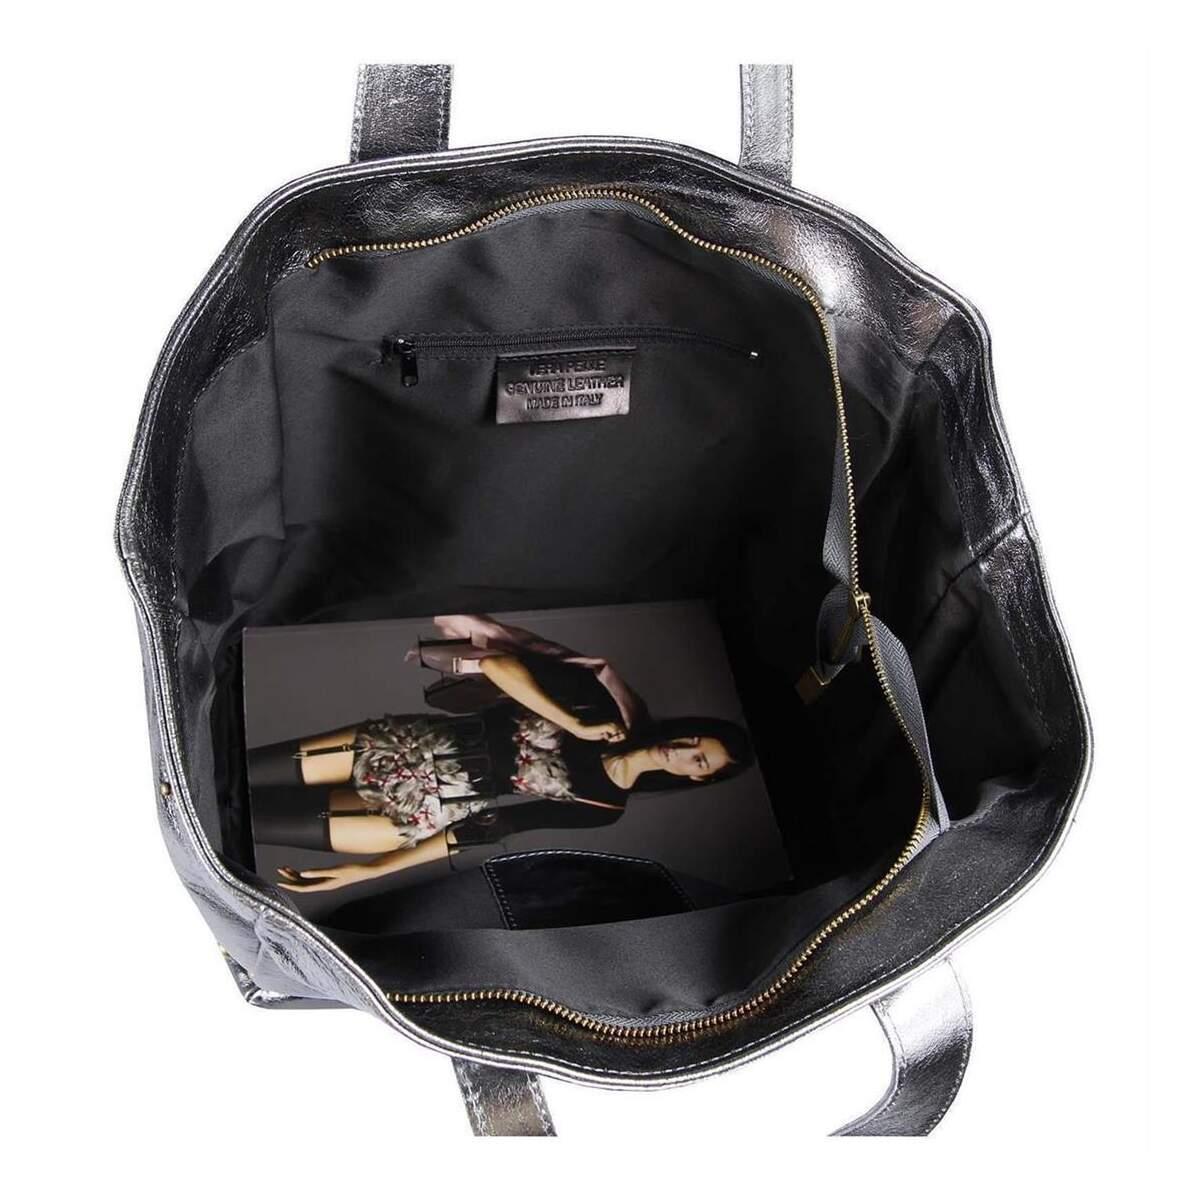 damen echt leder tasche tote bag metallic schultertasche. Black Bedroom Furniture Sets. Home Design Ideas